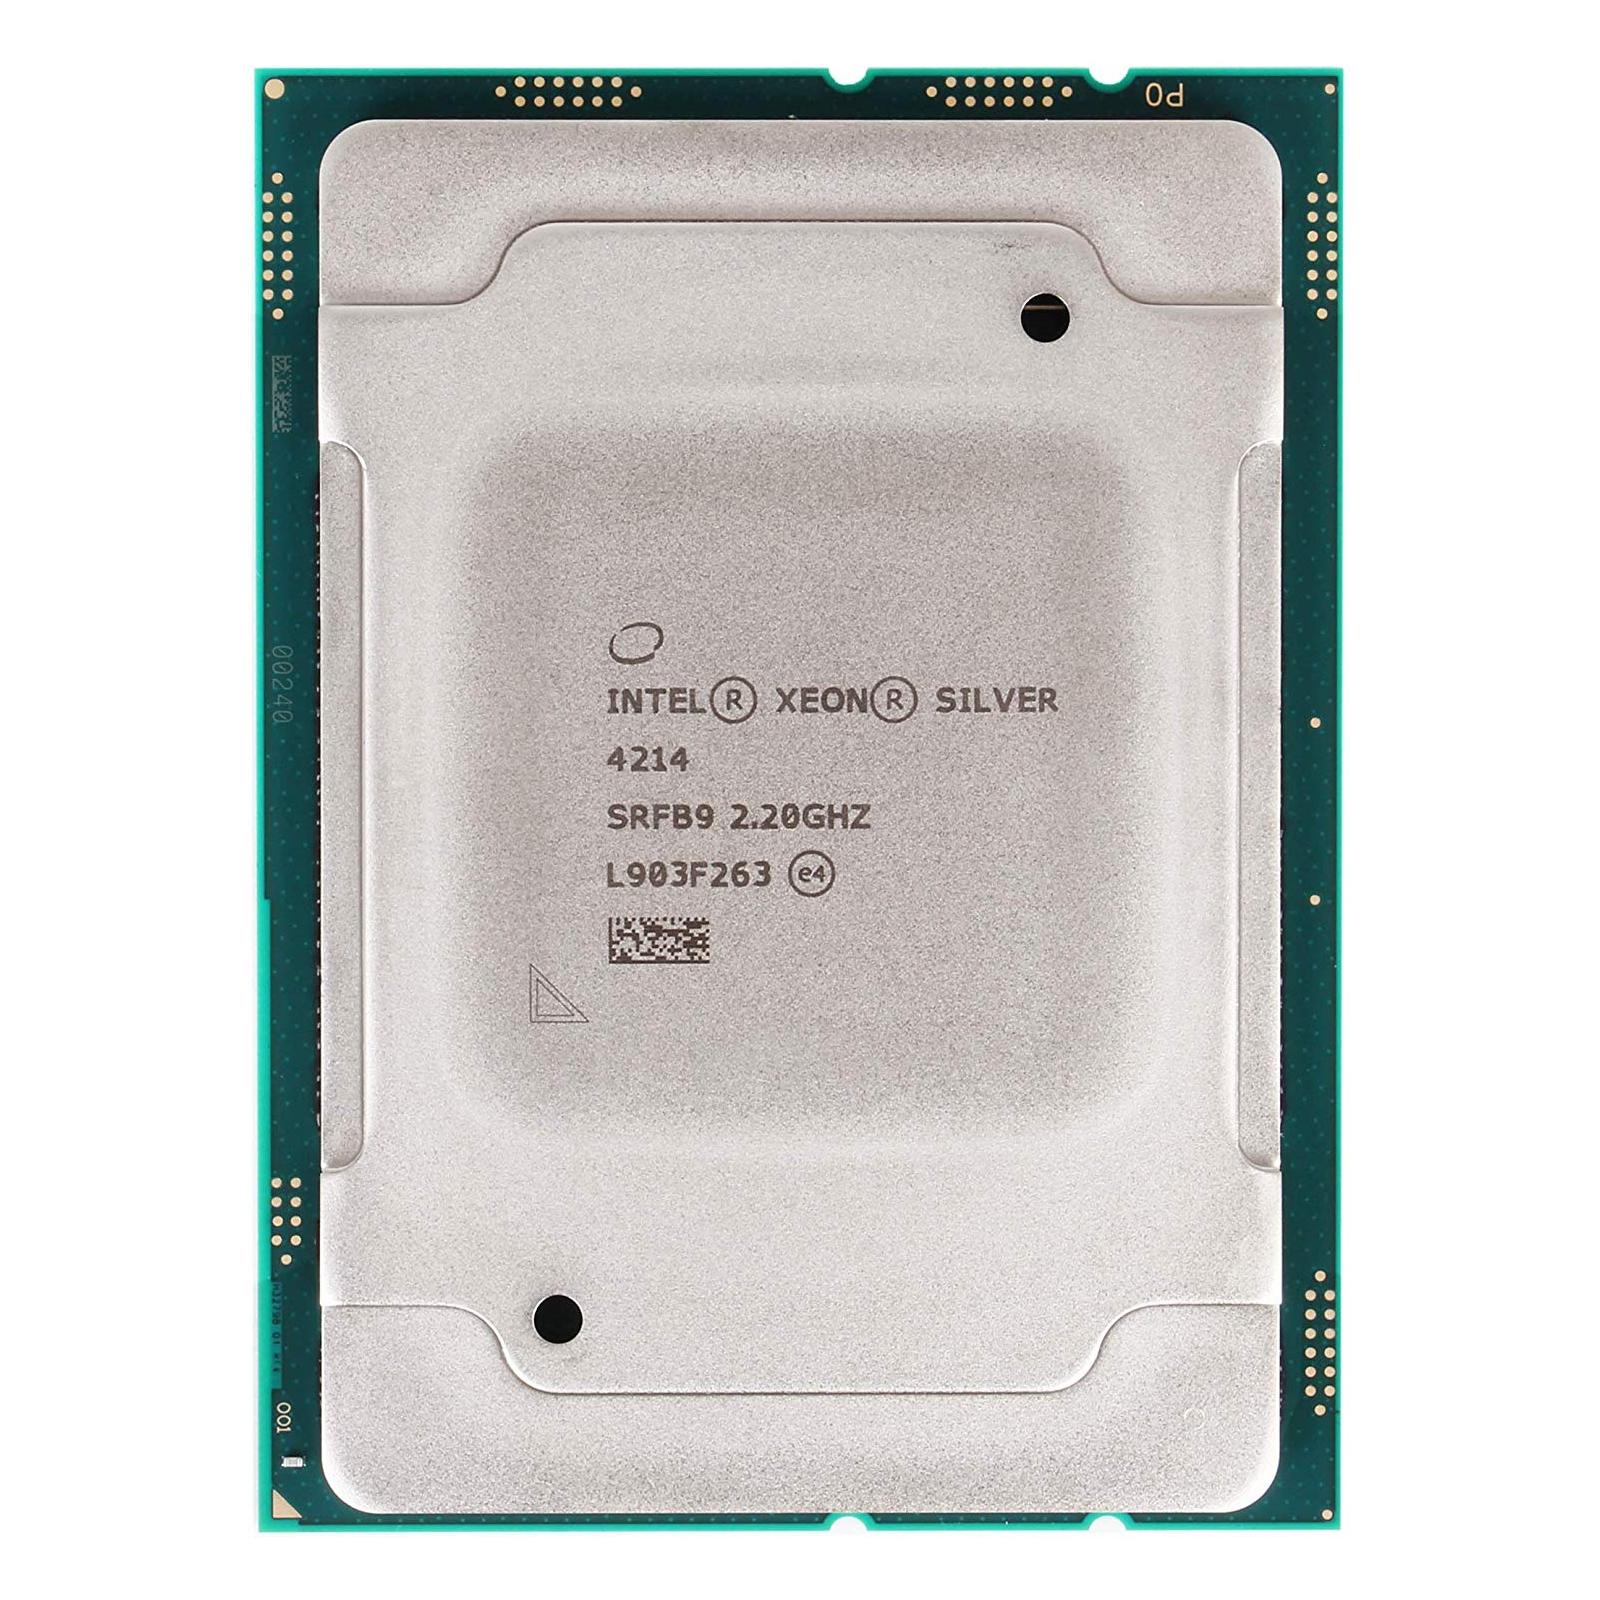 Процессор серверный Supermicro Xeon Silver 4214 12C/24T/2.20GHz/16.5MB/FCLGA3647 (P4X-CLX4214-SRFB9)